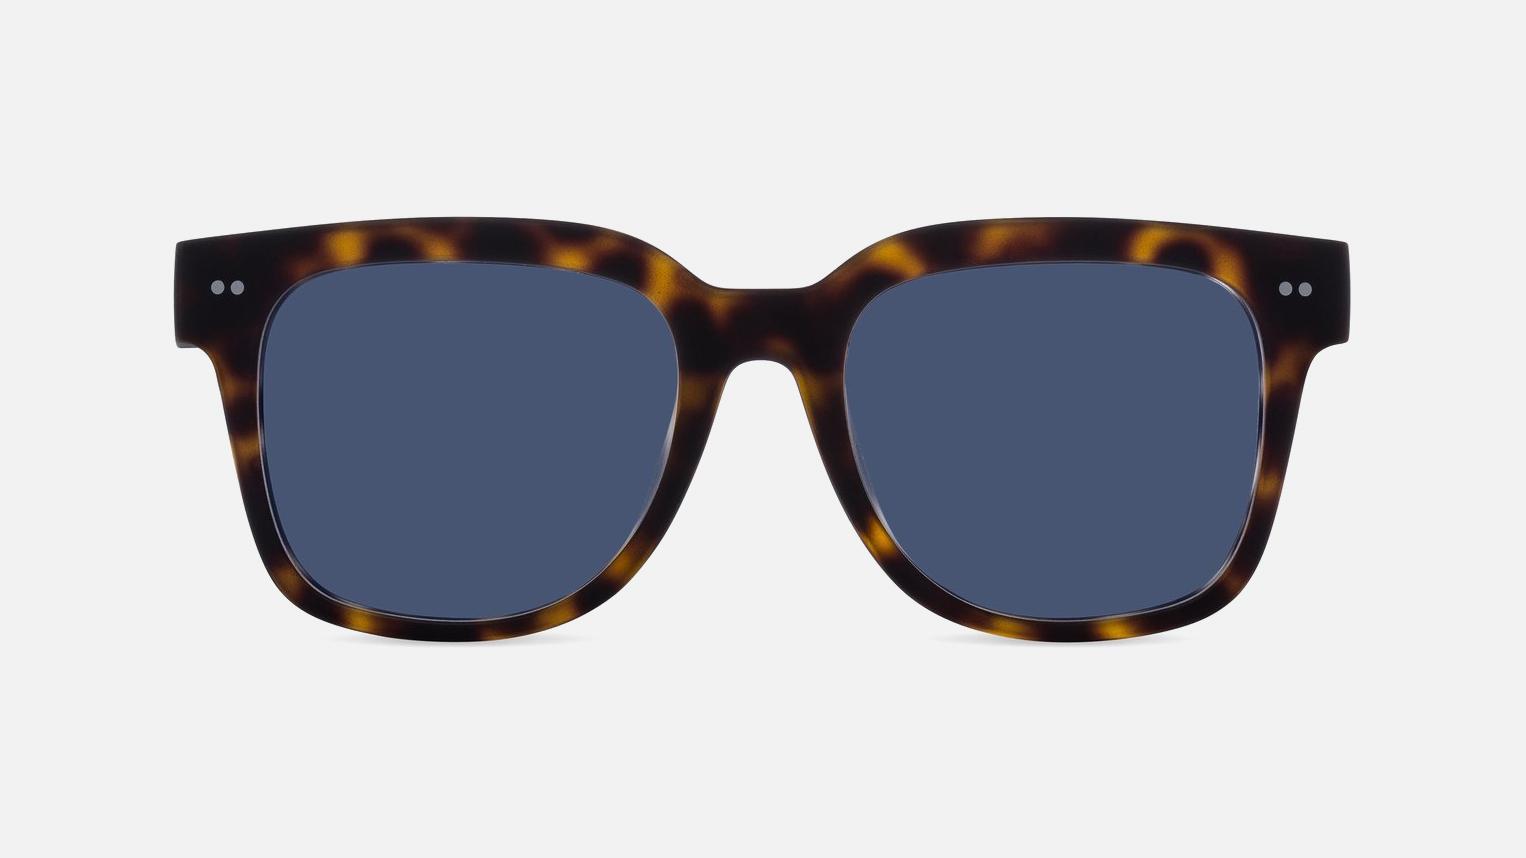 Look Optic Reading Sunglasses